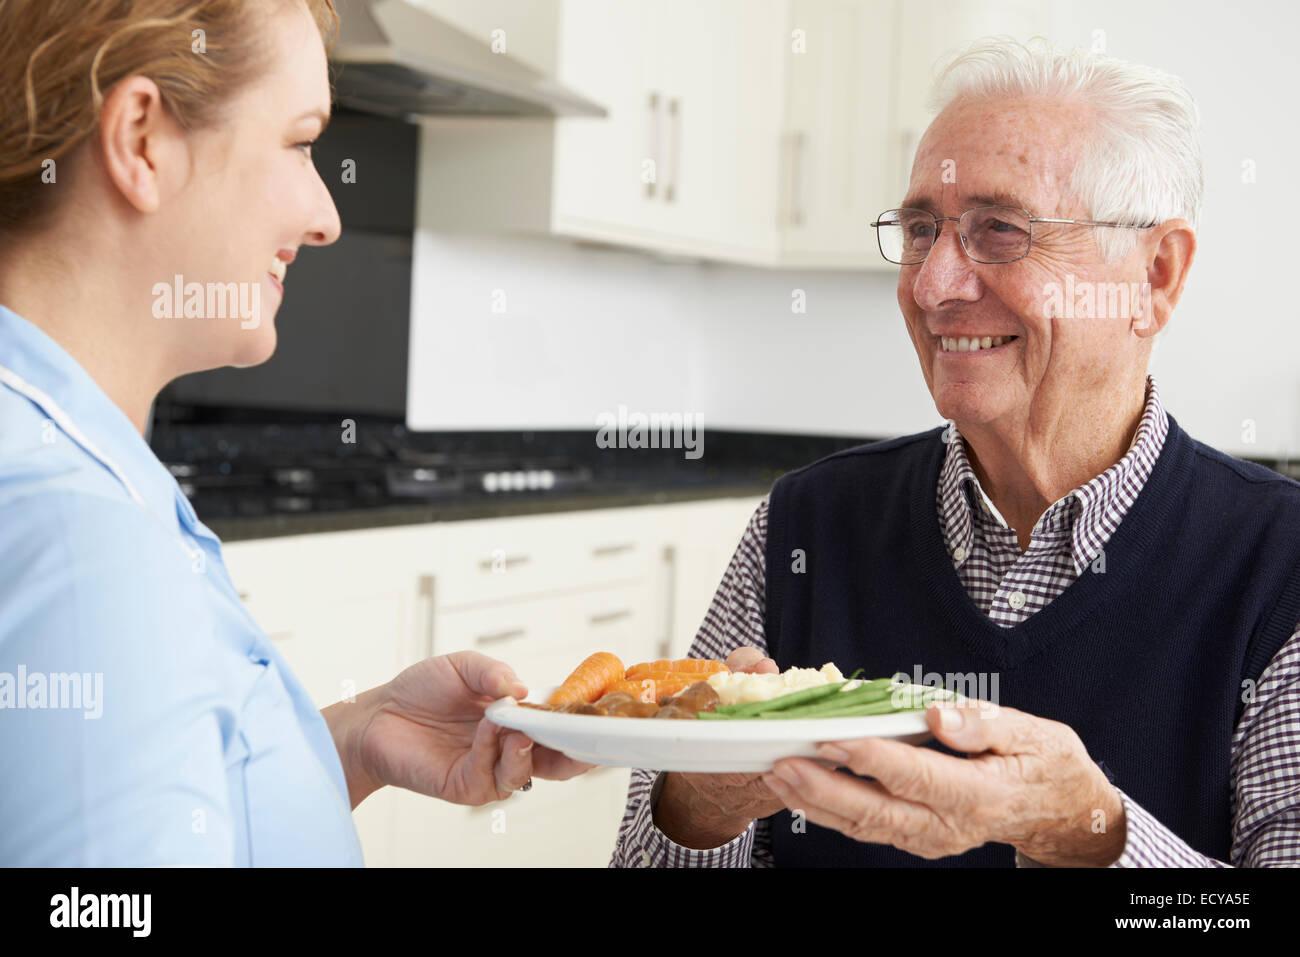 Carer Serving Lunch To Senior Man - Stock Image